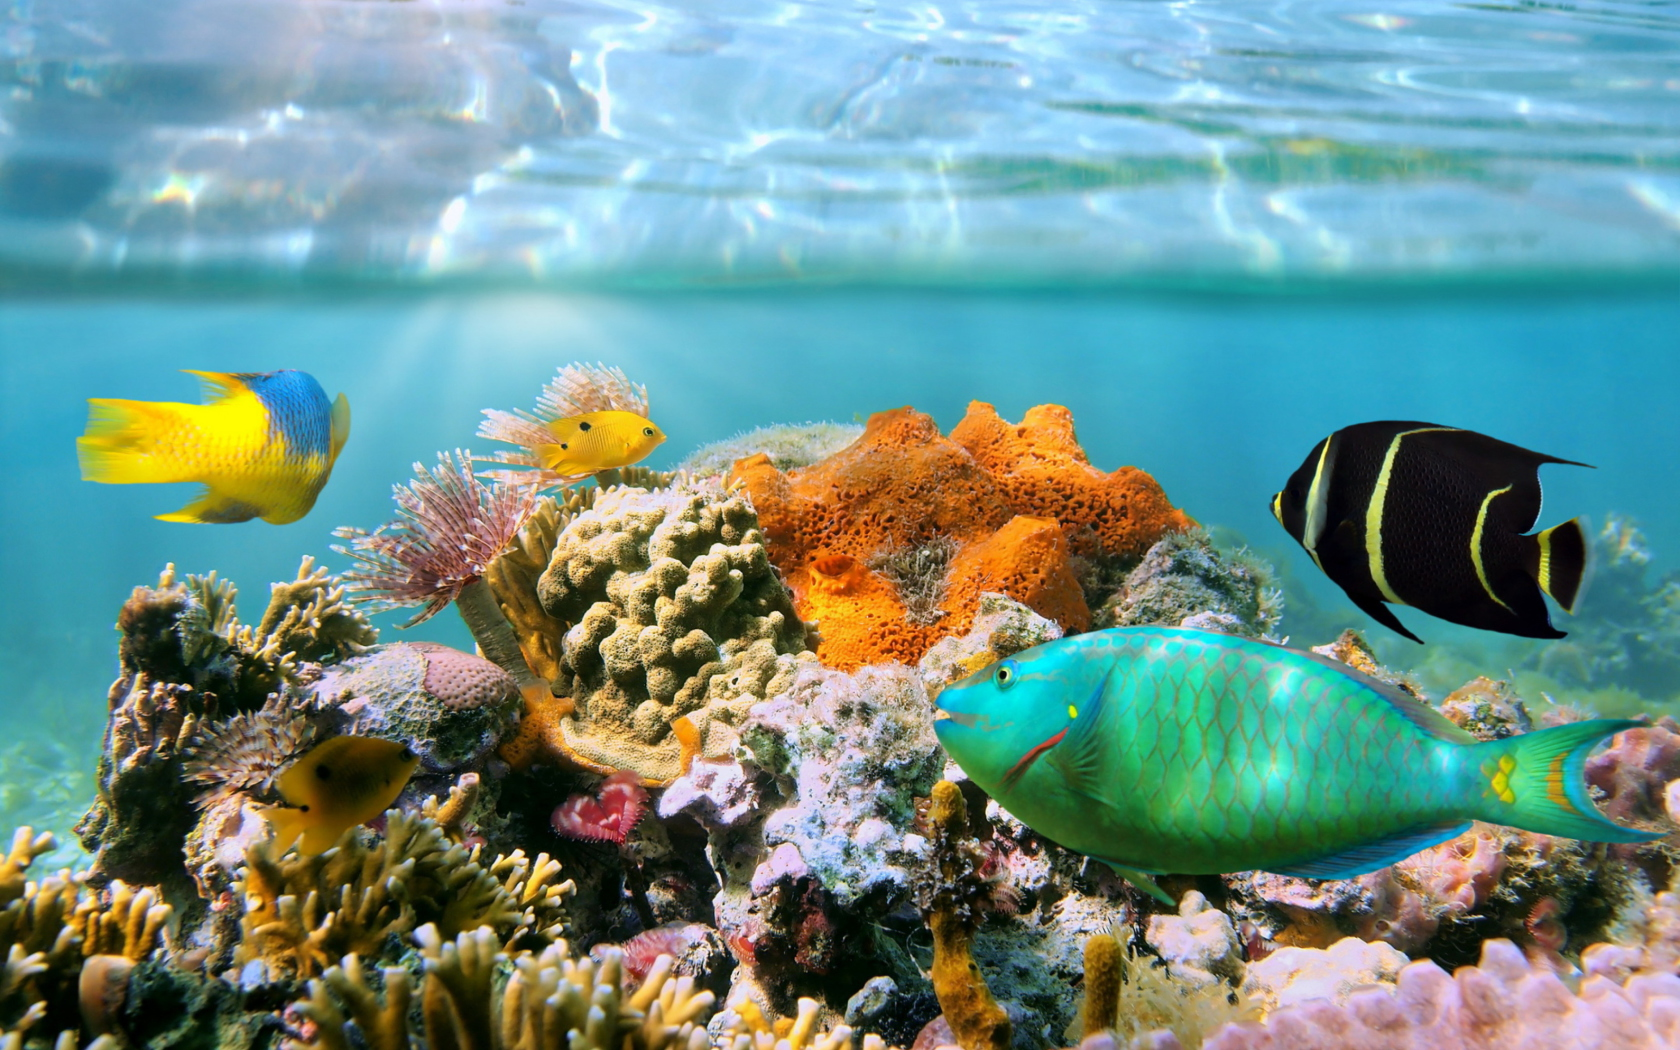 Coral Reef Wallpaper for Widescreen Desktop PC 1680x1050 1680x1050